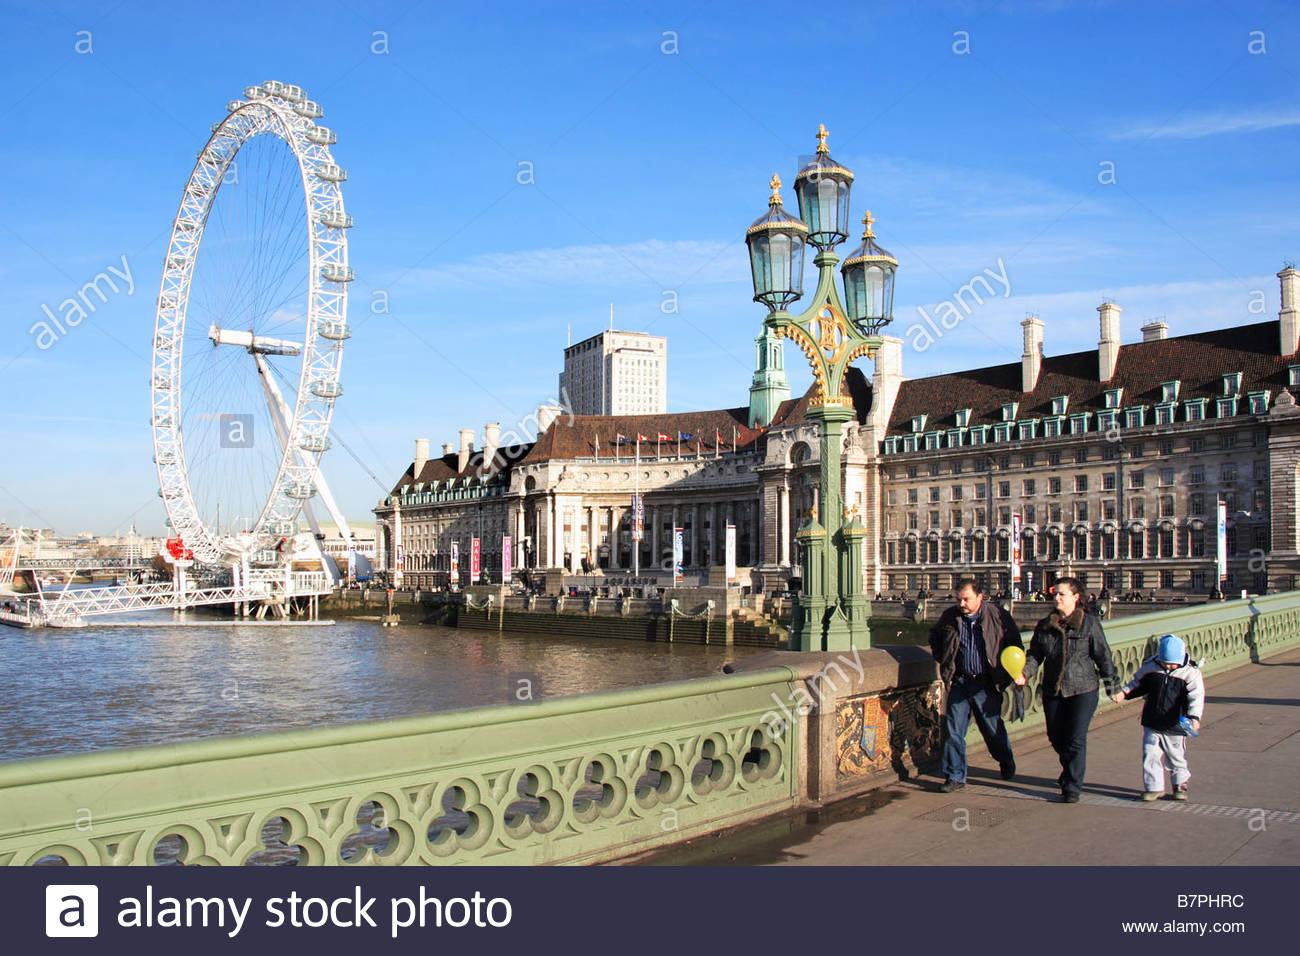 Das London Eye über der Themse Stockbild